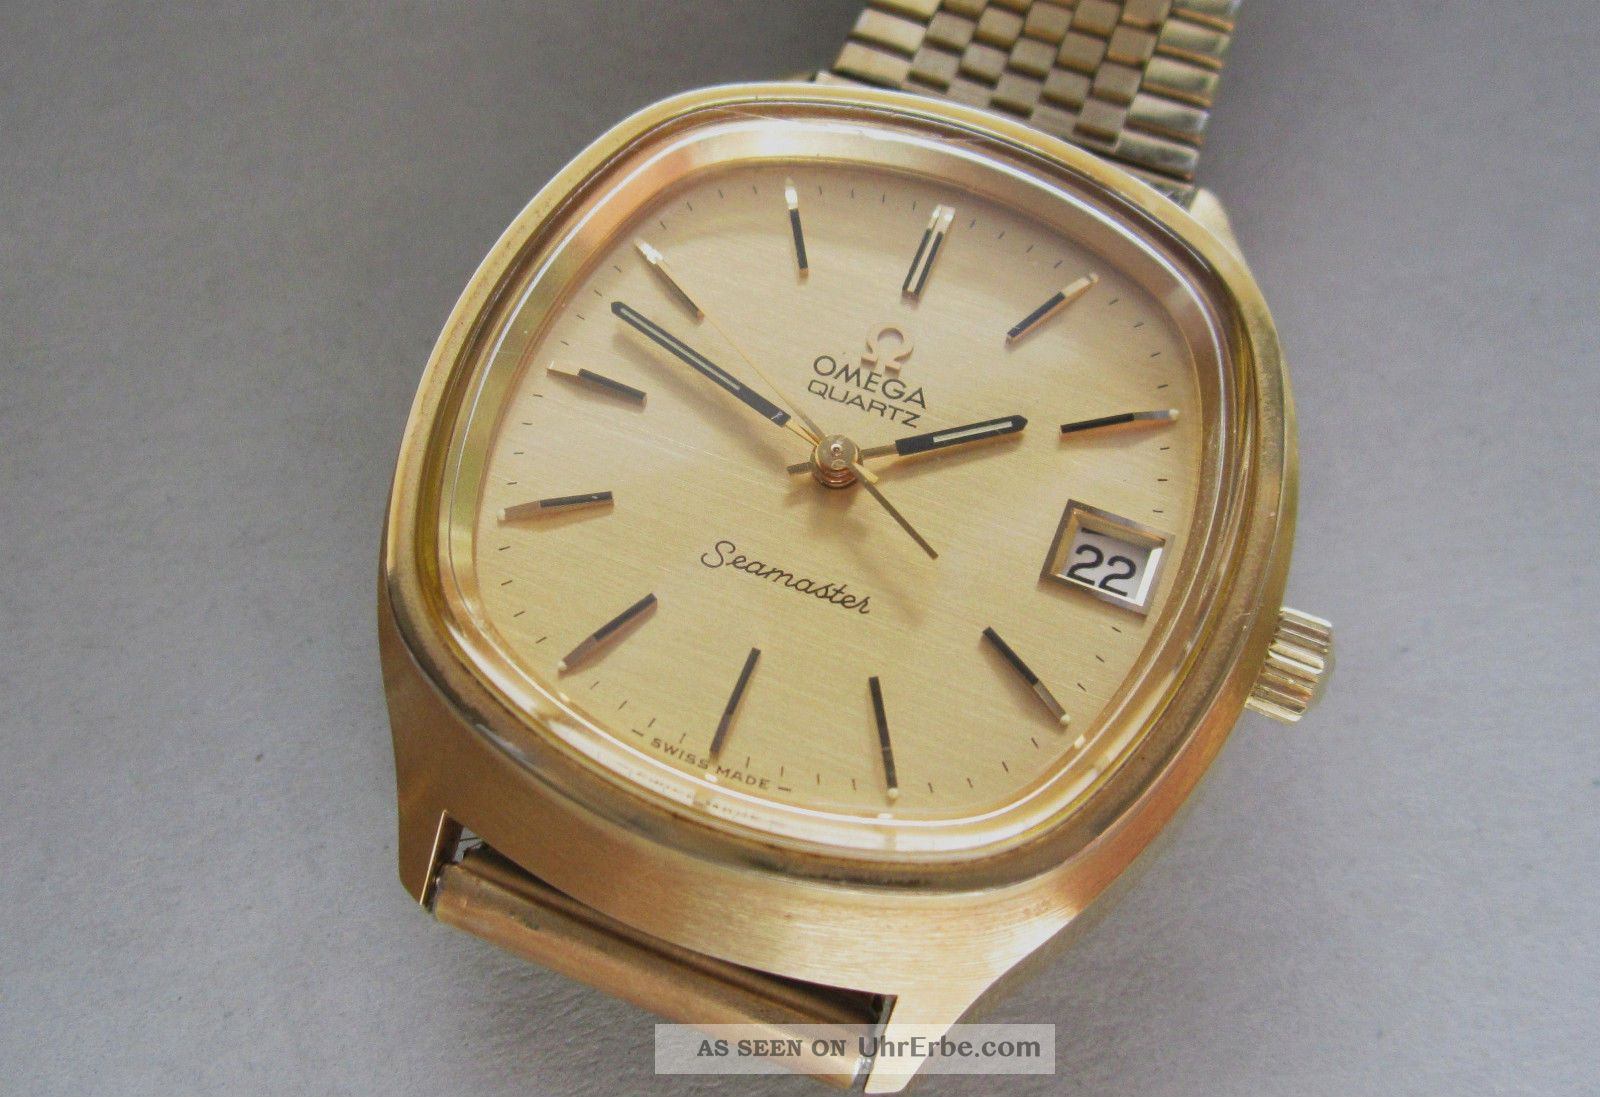 Omega Seamaster Armbanduhr Kaliber 1315 Quartz Herren Armbanduhr Armbanduhren Bild